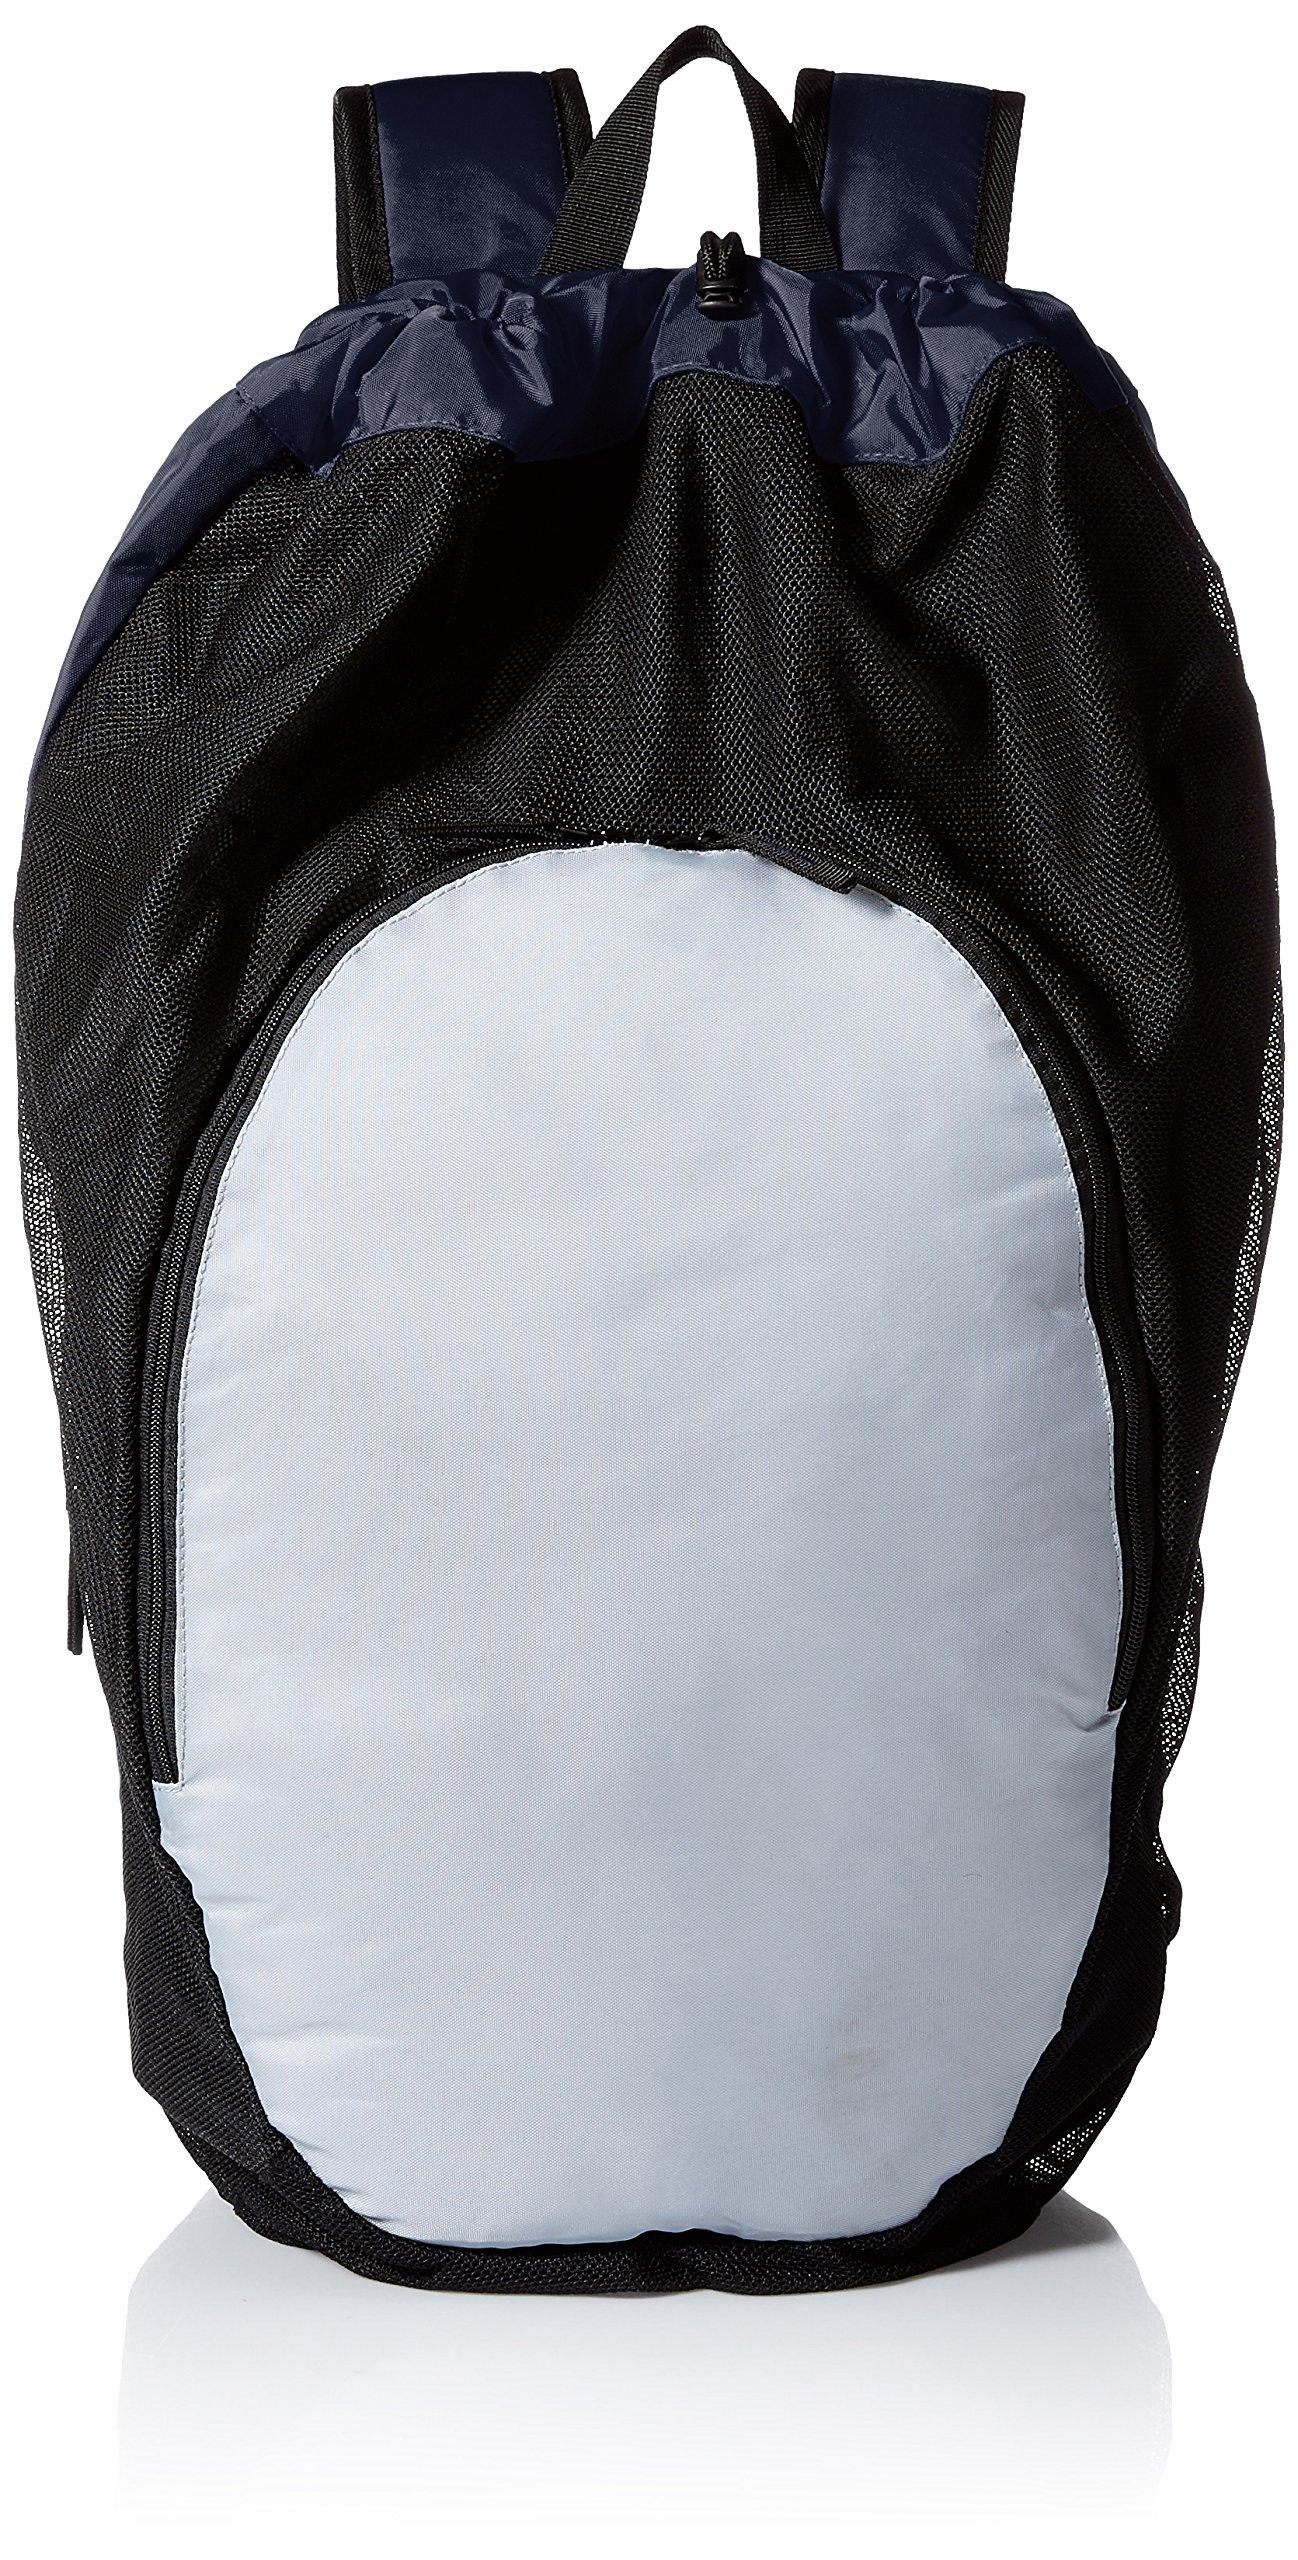 ASICS Gear Bag 2.0, Navy/Athletic Grey, One Size